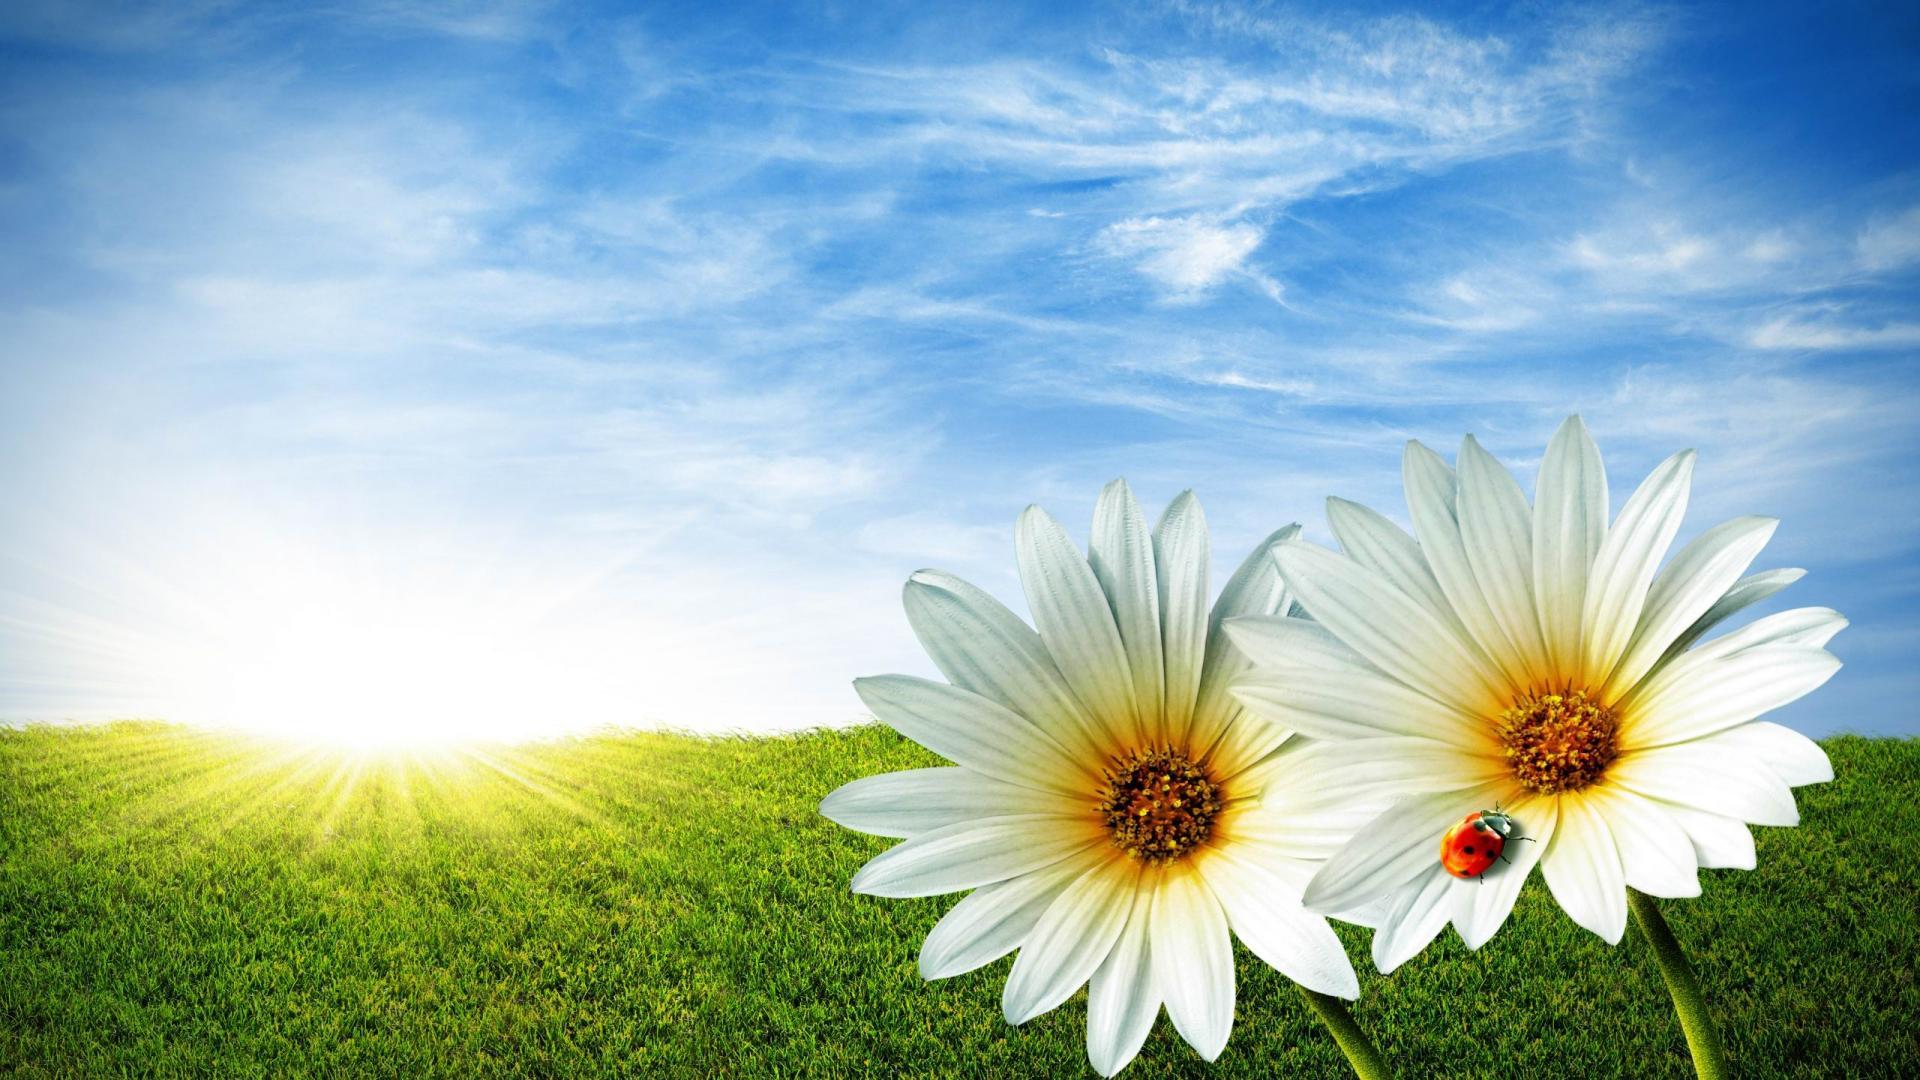 Beautiful Spring Desktop Wallpaper HD Wallpaper 1920x1080